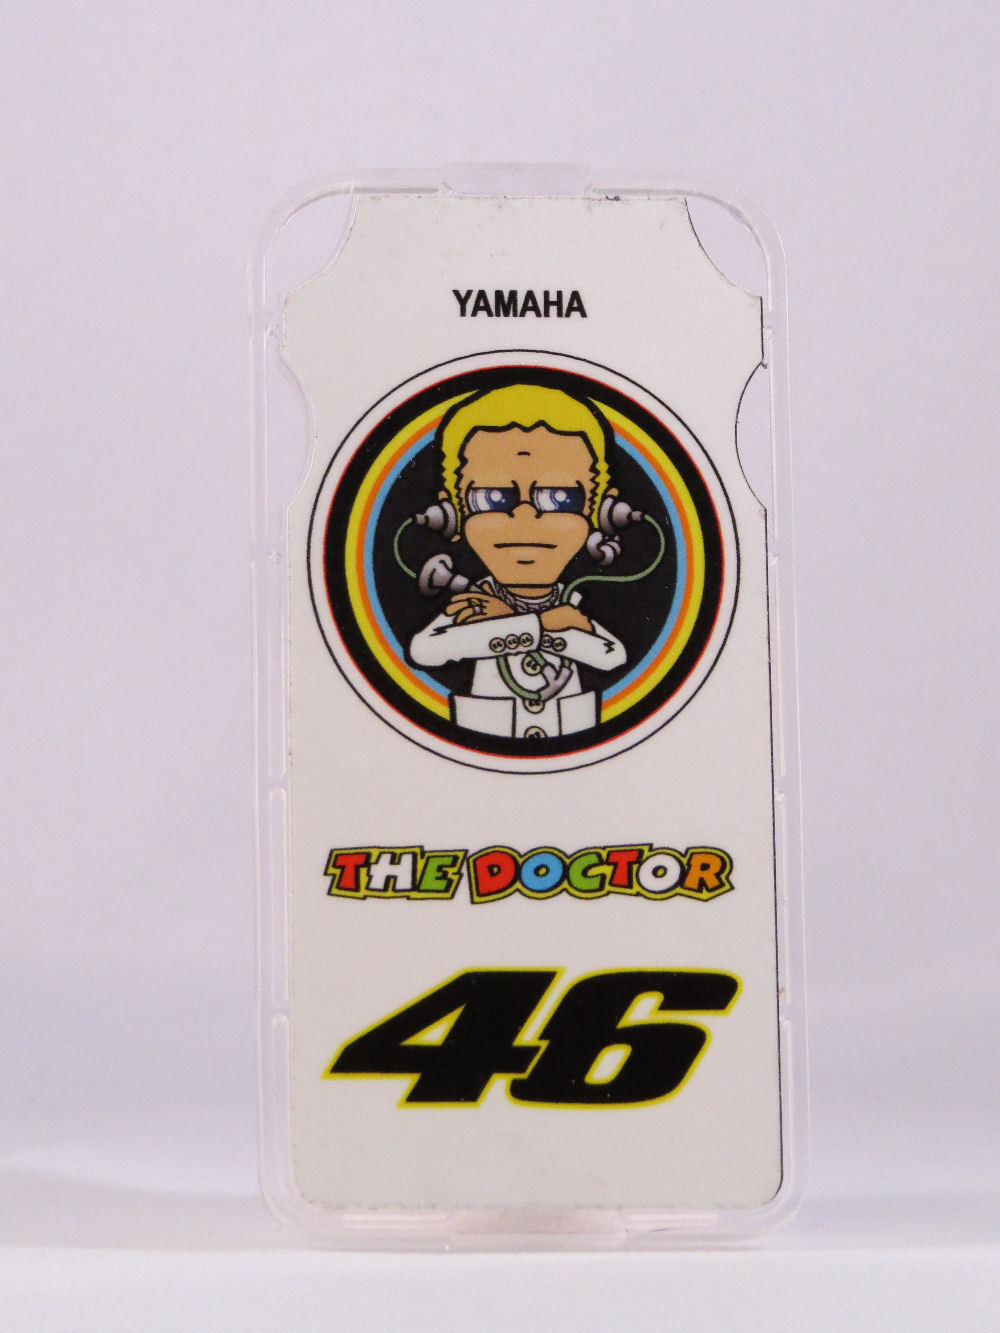 1:12 Pit board pitboards Valentino Rossi 108 Victories Misano 2014 to minichamps